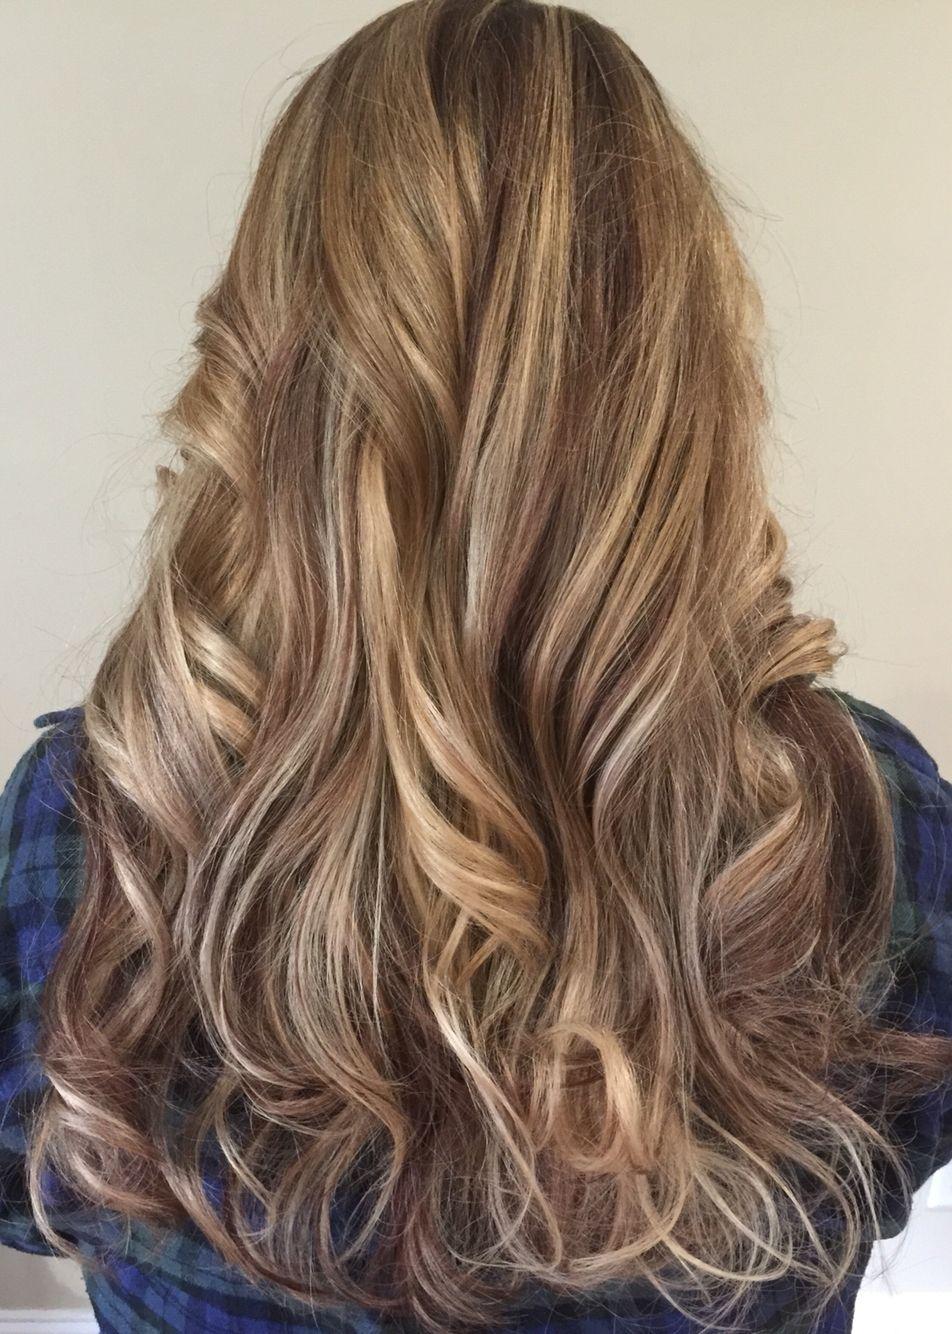 Blonde Highlights Against Mocha Color Hair Pinterest Blondes